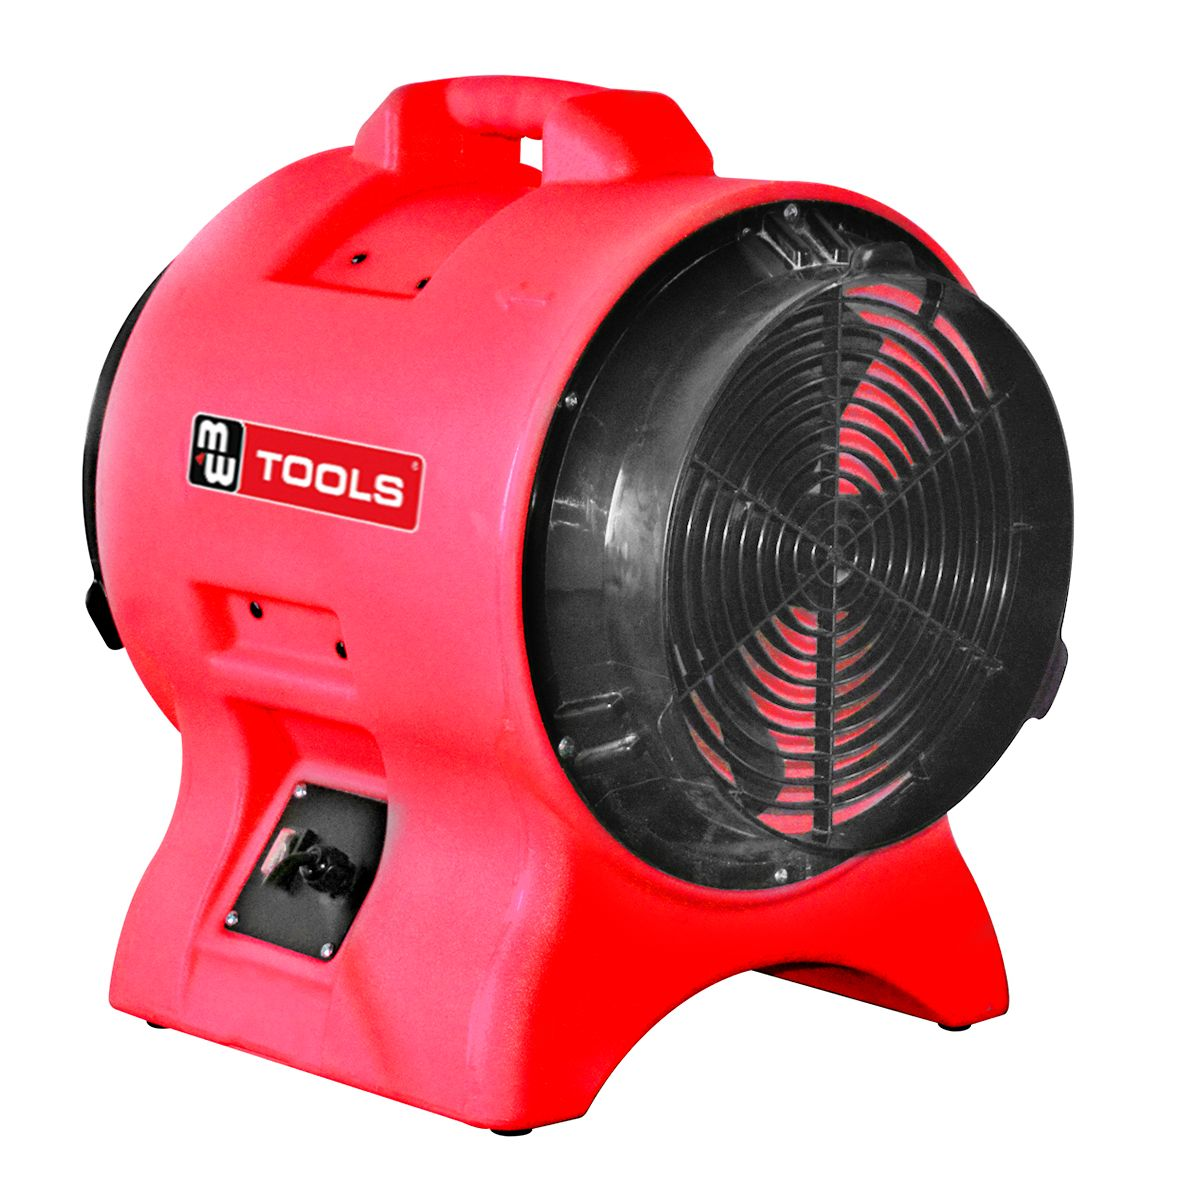 ventilateur extracteur portable 200 mm 250 w. Black Bedroom Furniture Sets. Home Design Ideas